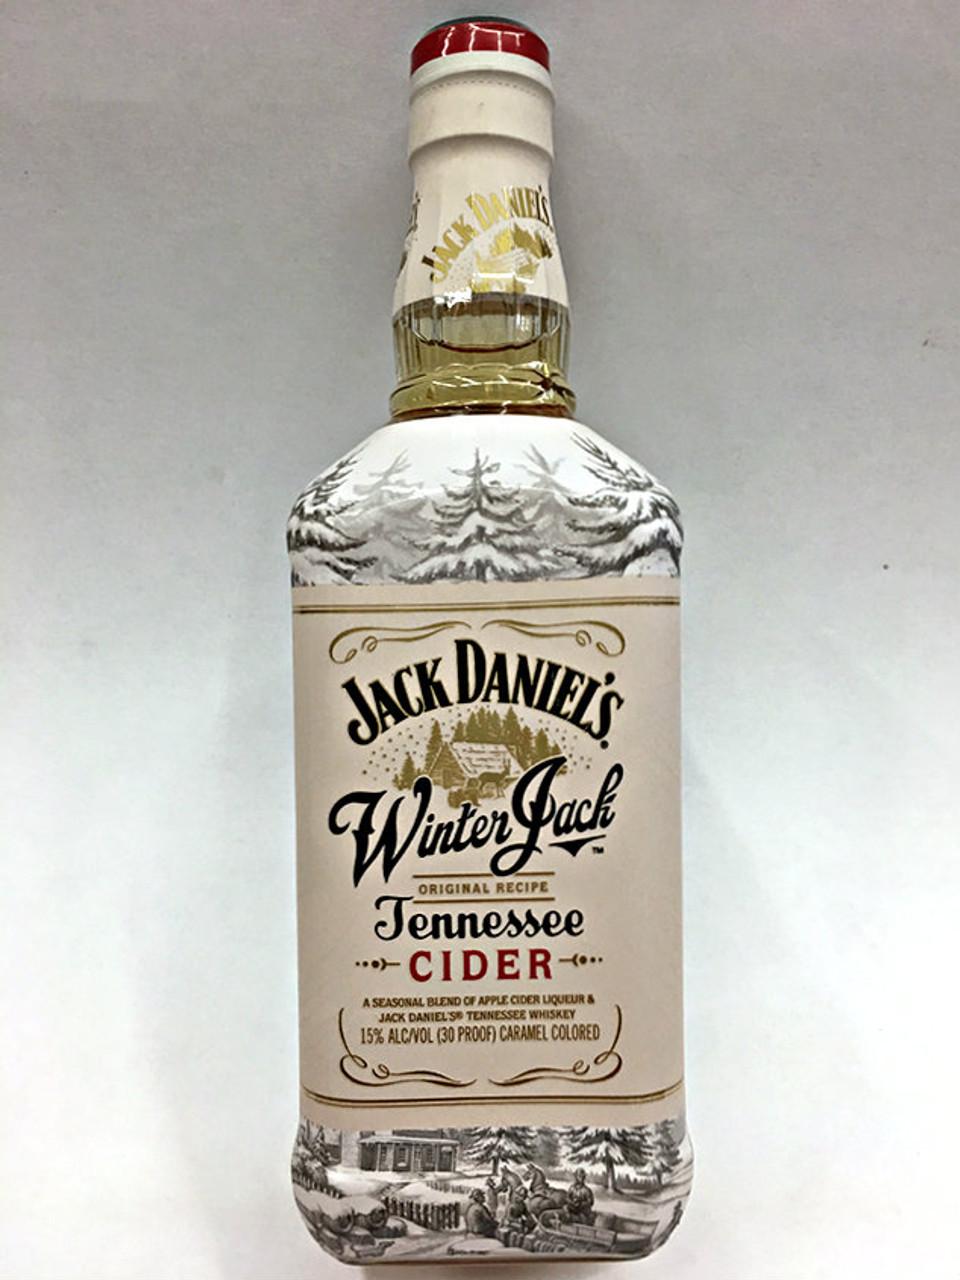 Jack Daniel Winter Jack 750ml